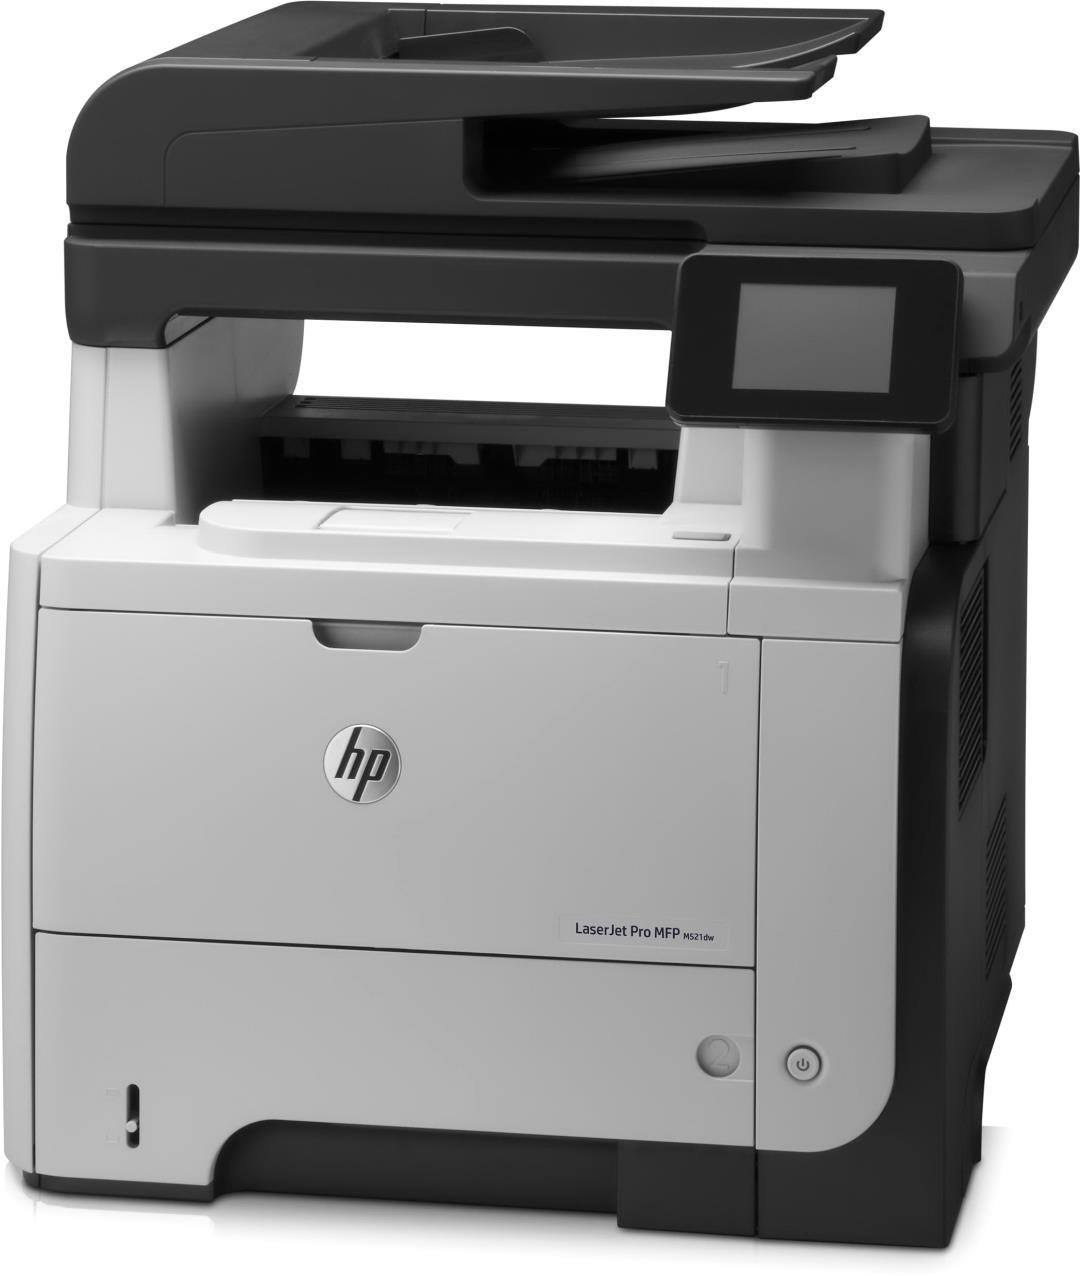 Descargar (Downloads) HP Color LaserJet Pro M521dw MFP Driver Impresora Y Instalar Completo